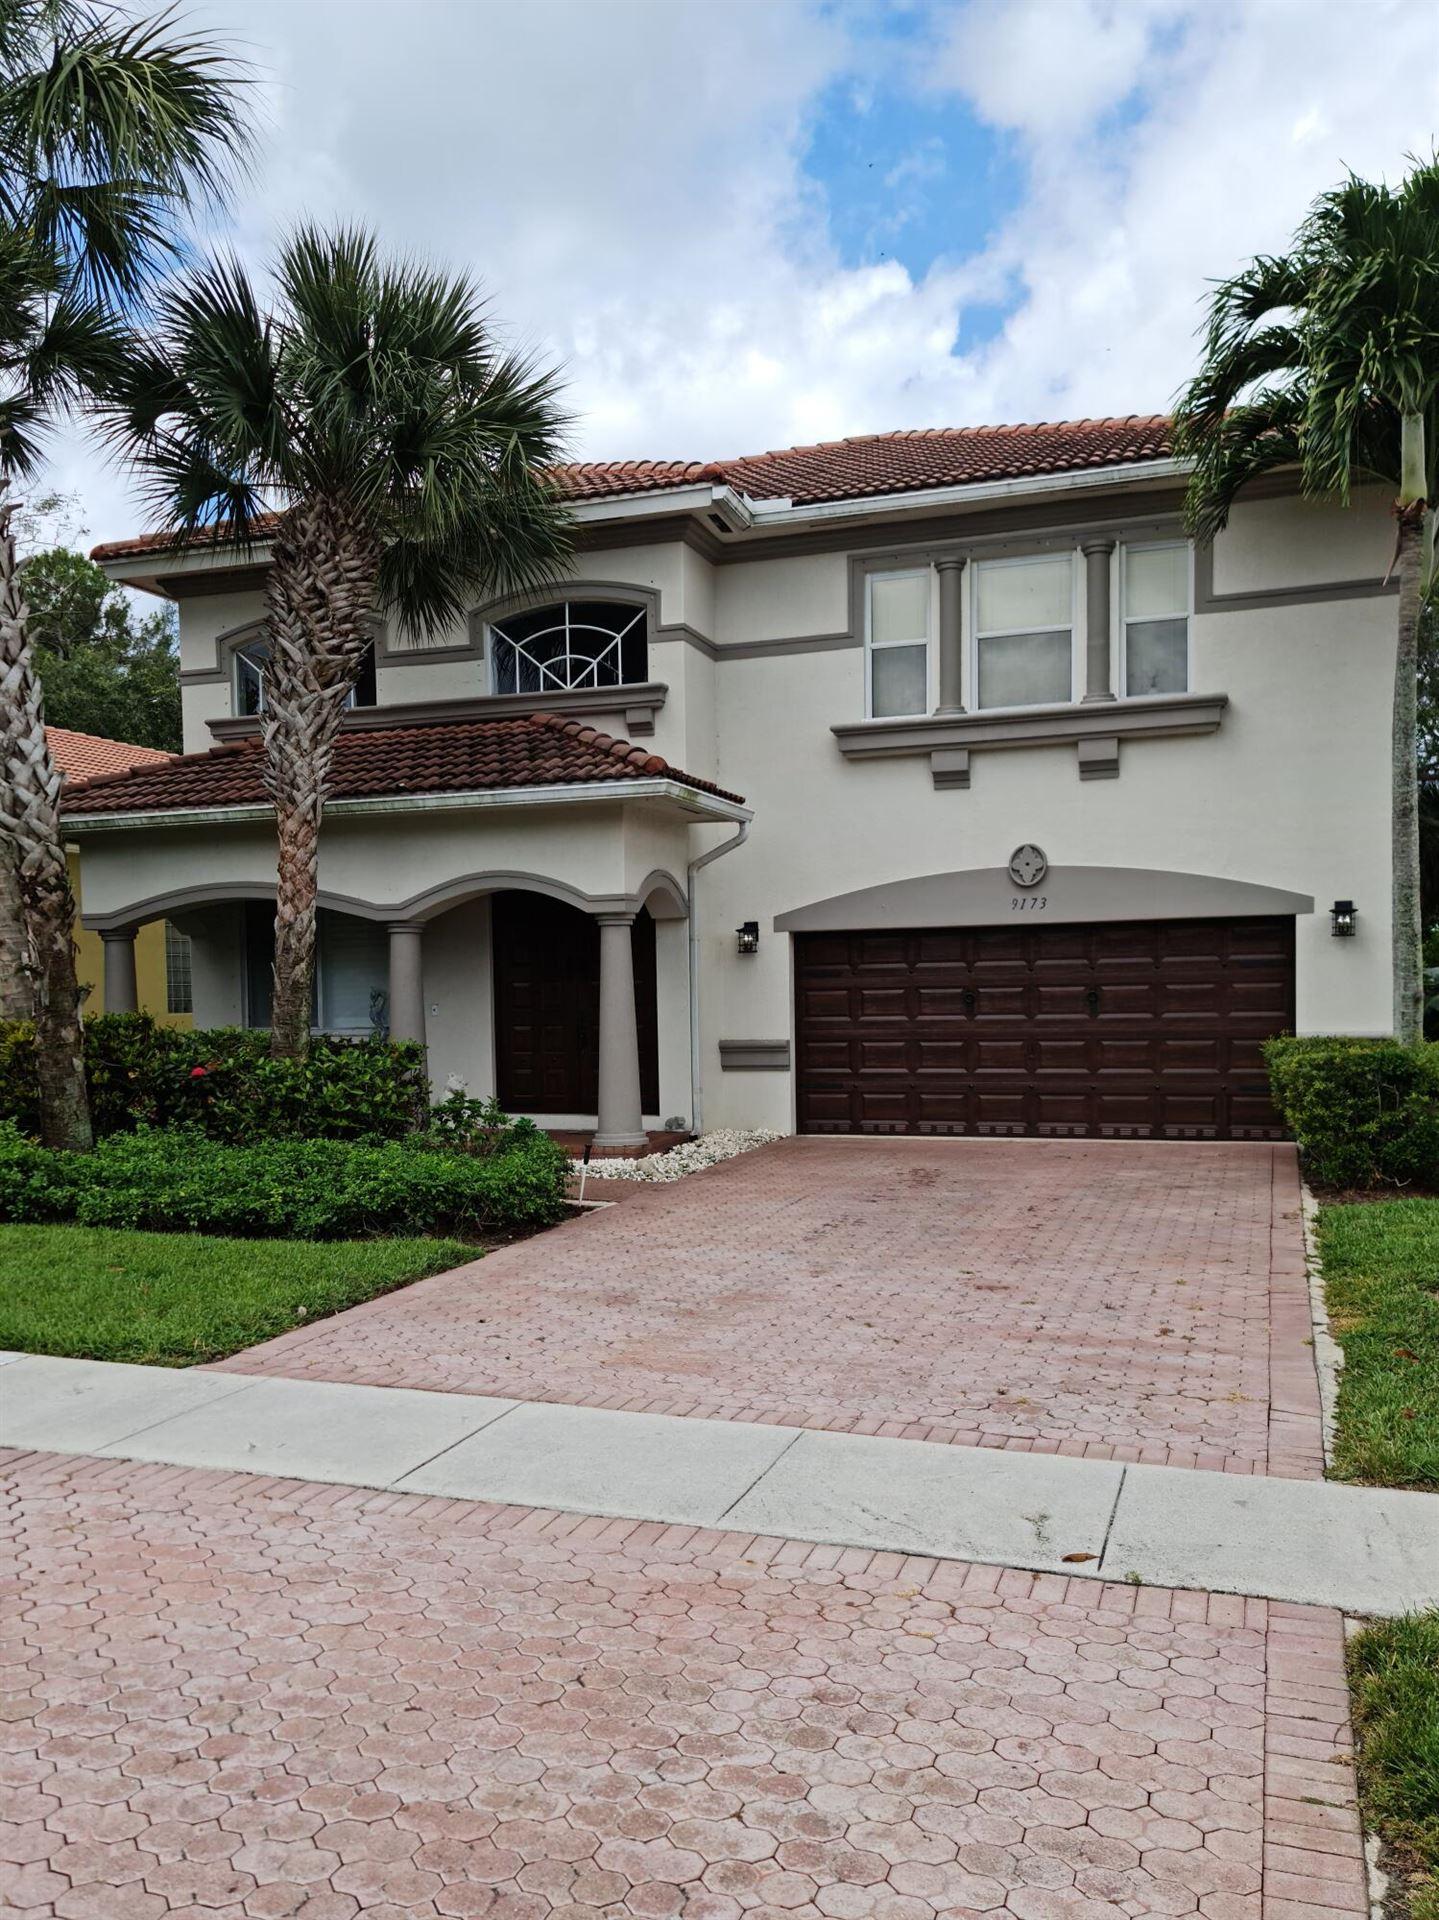 9173 Silver Glen Way, Lake Worth, FL 33467 - MLS#: RX-10723612